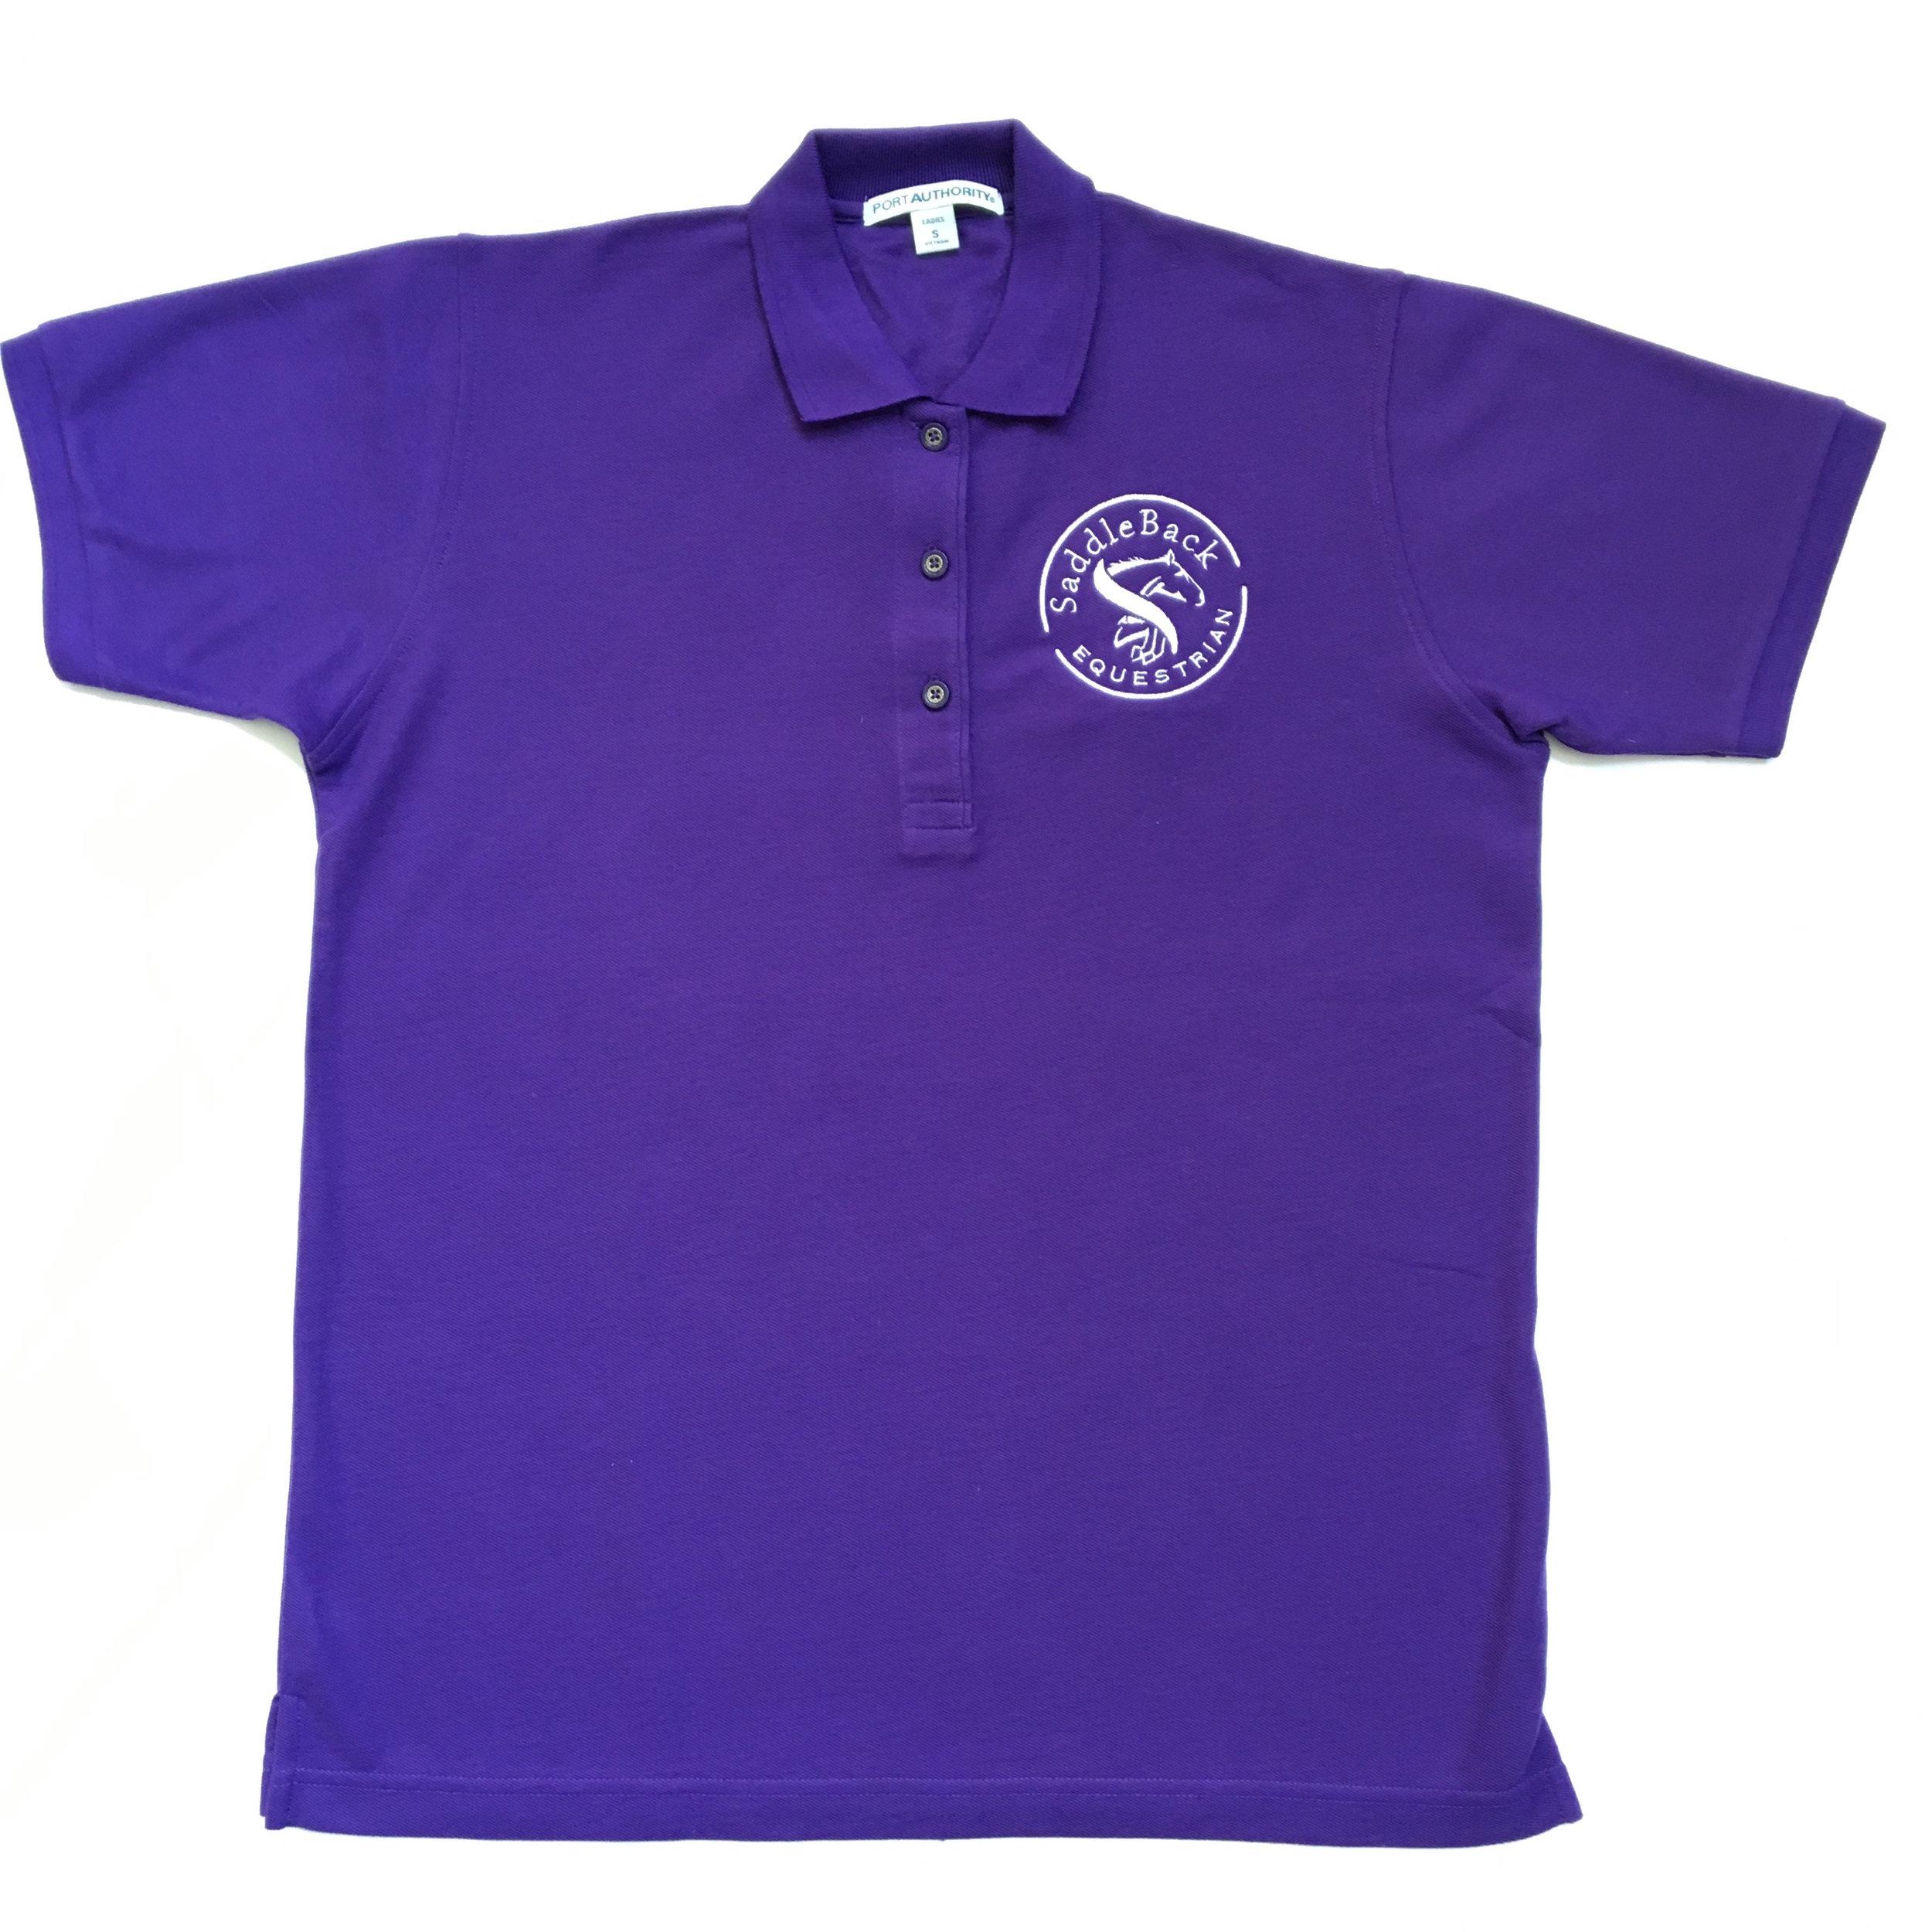 SBE purple polo.JPG